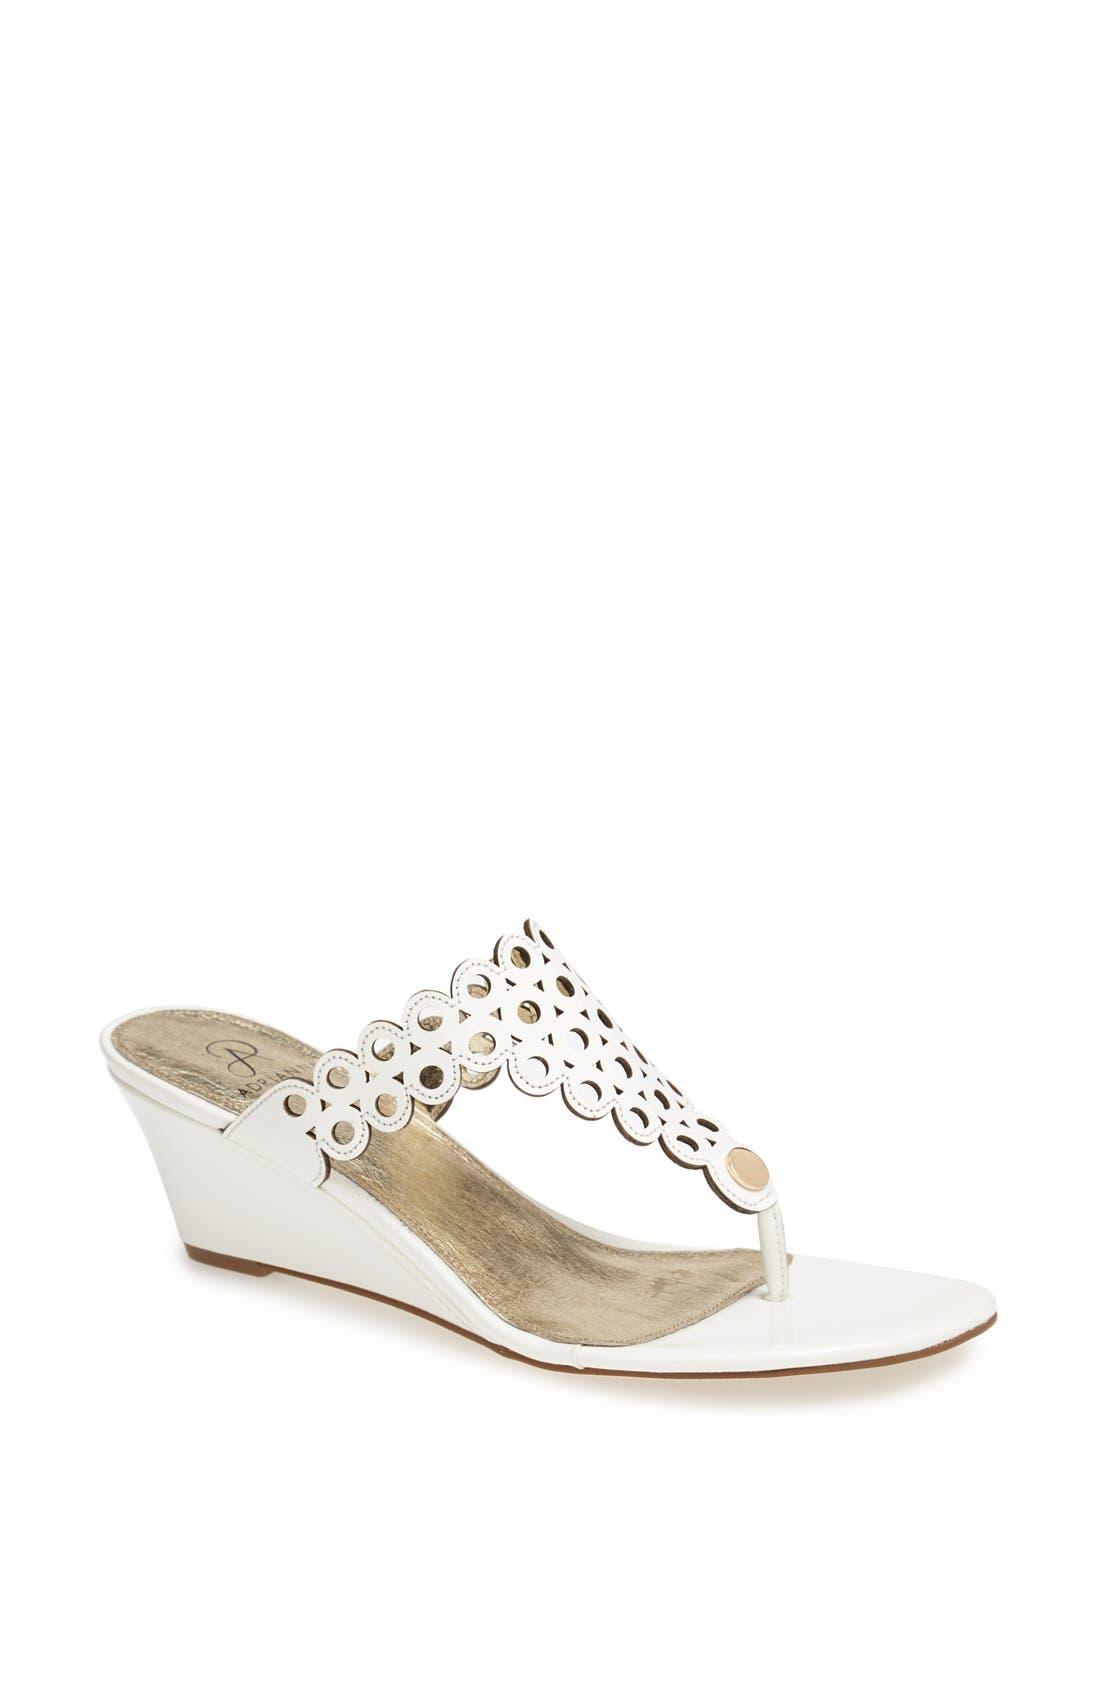 Main Image - Adrianna Papell 'Calais' Wedge Sandal